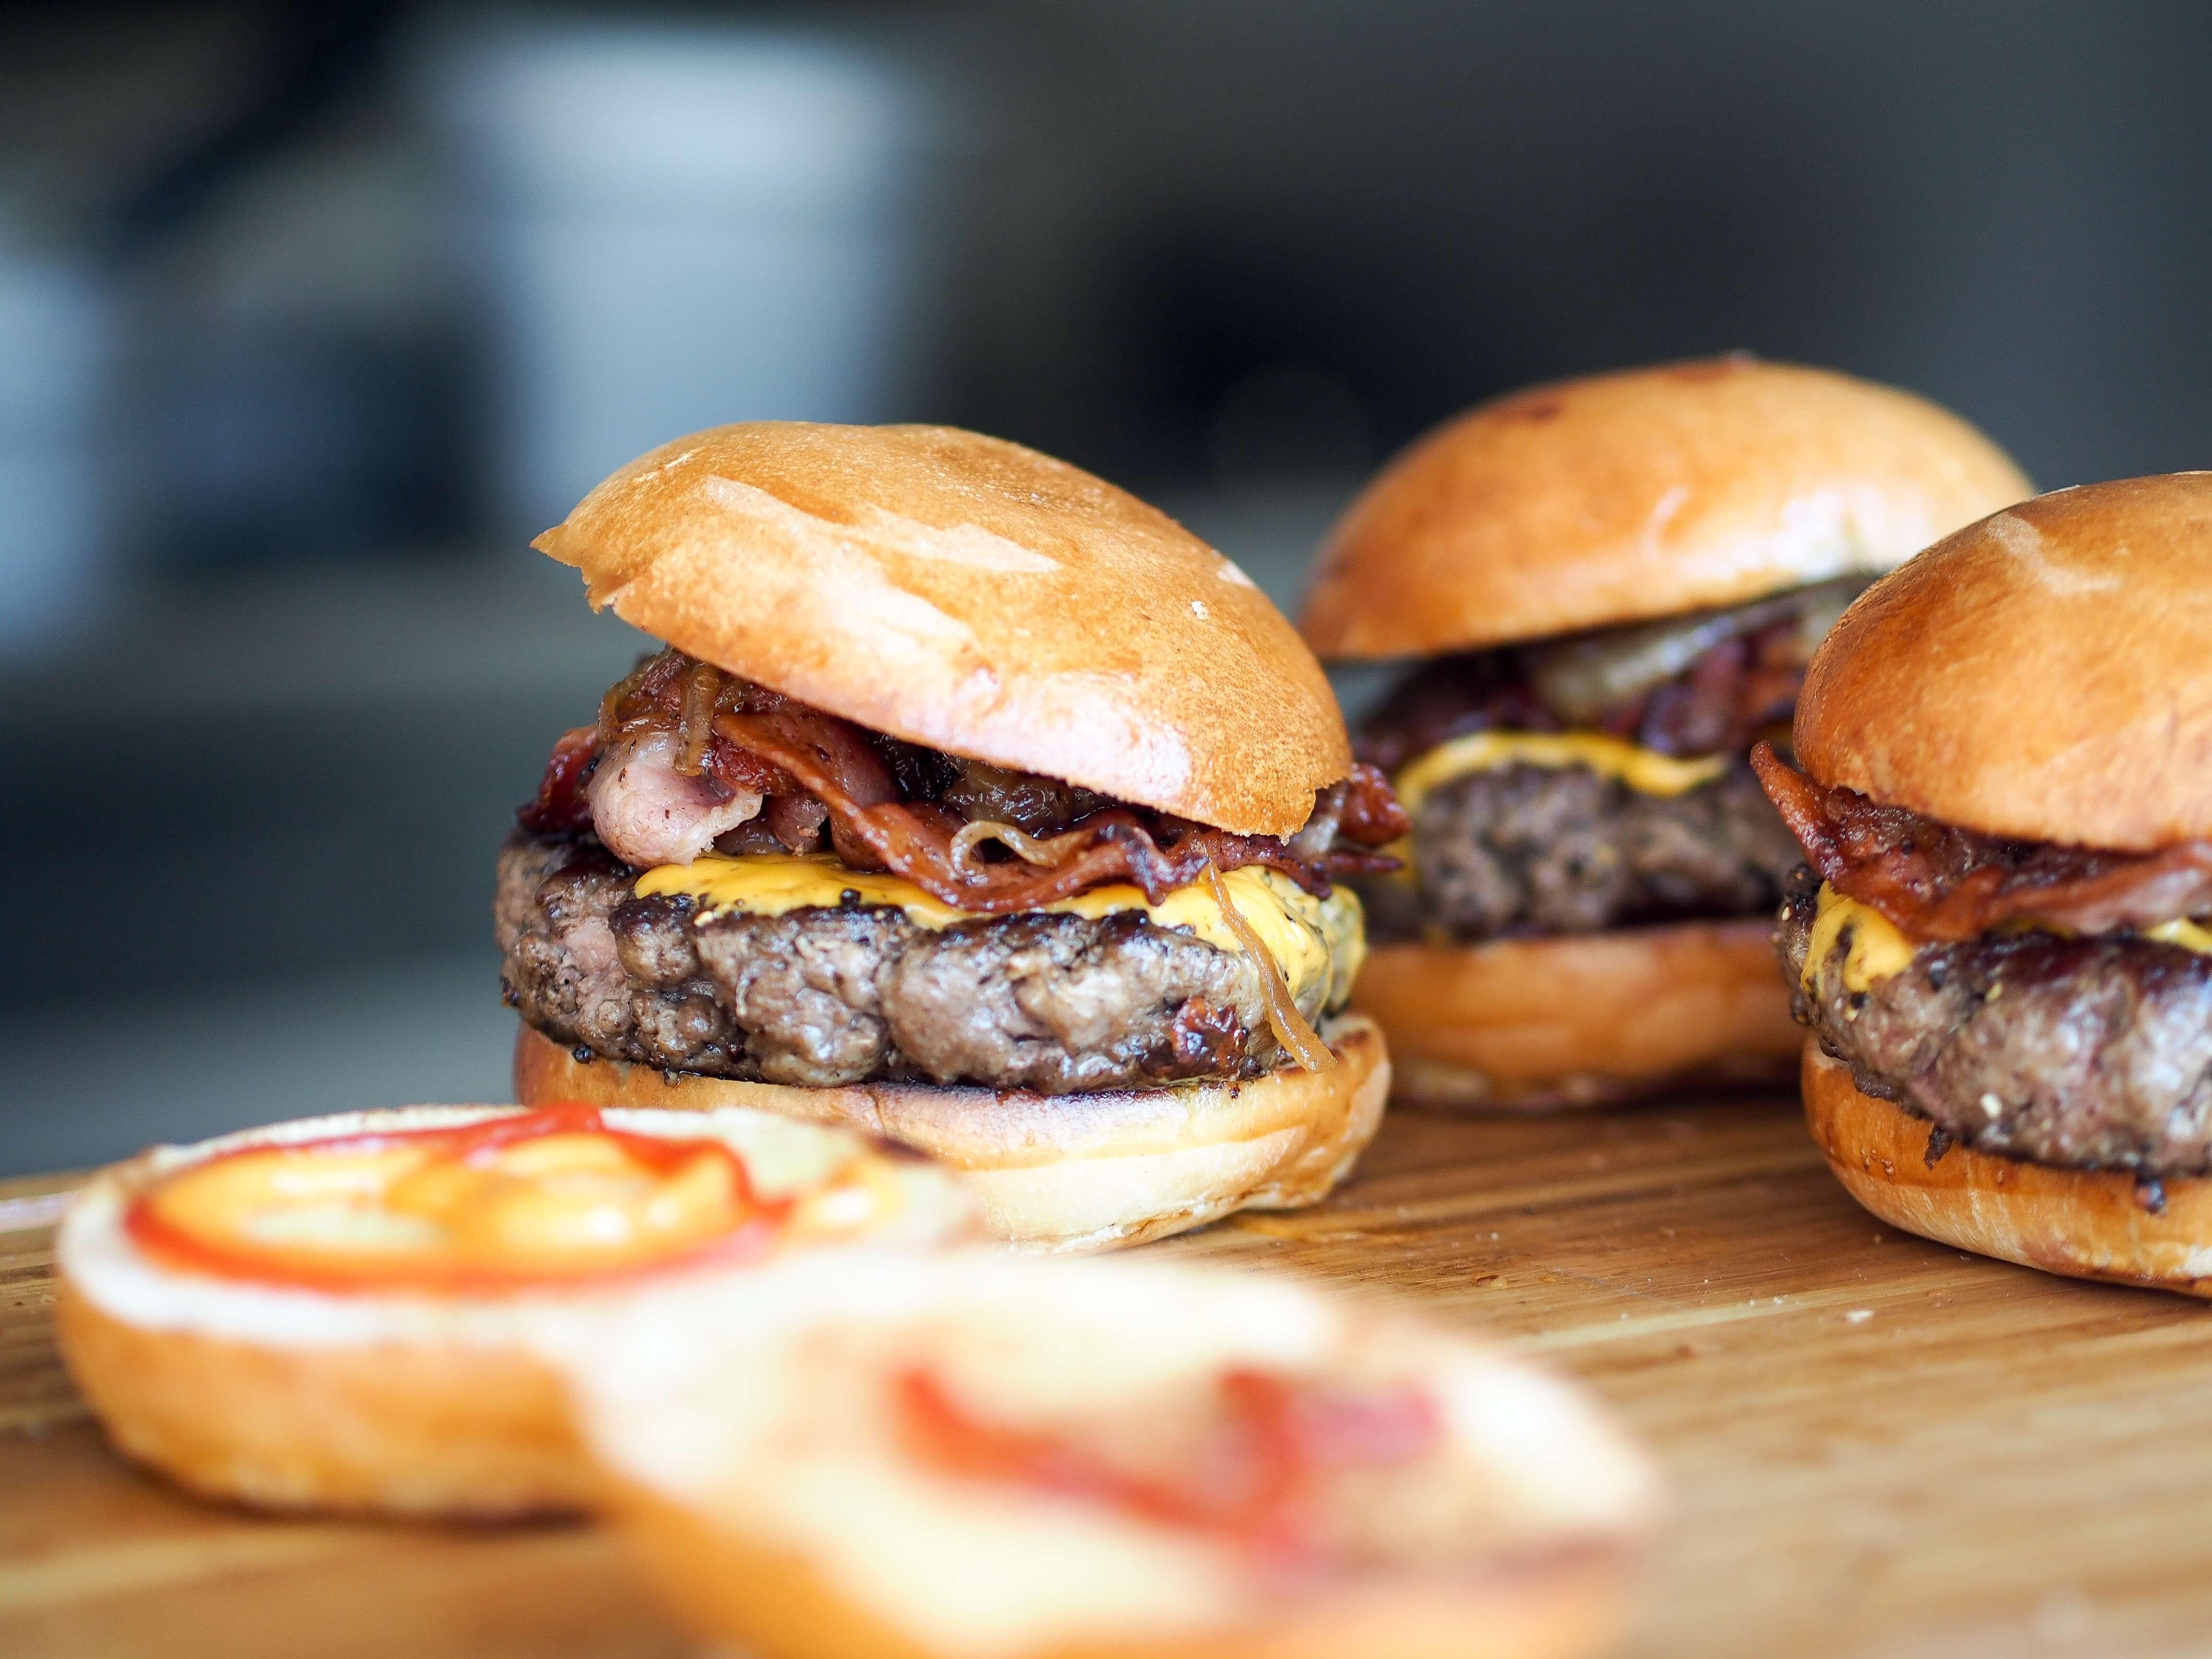 Permanent Hamburger Menus Look Cool, But Do They Work?